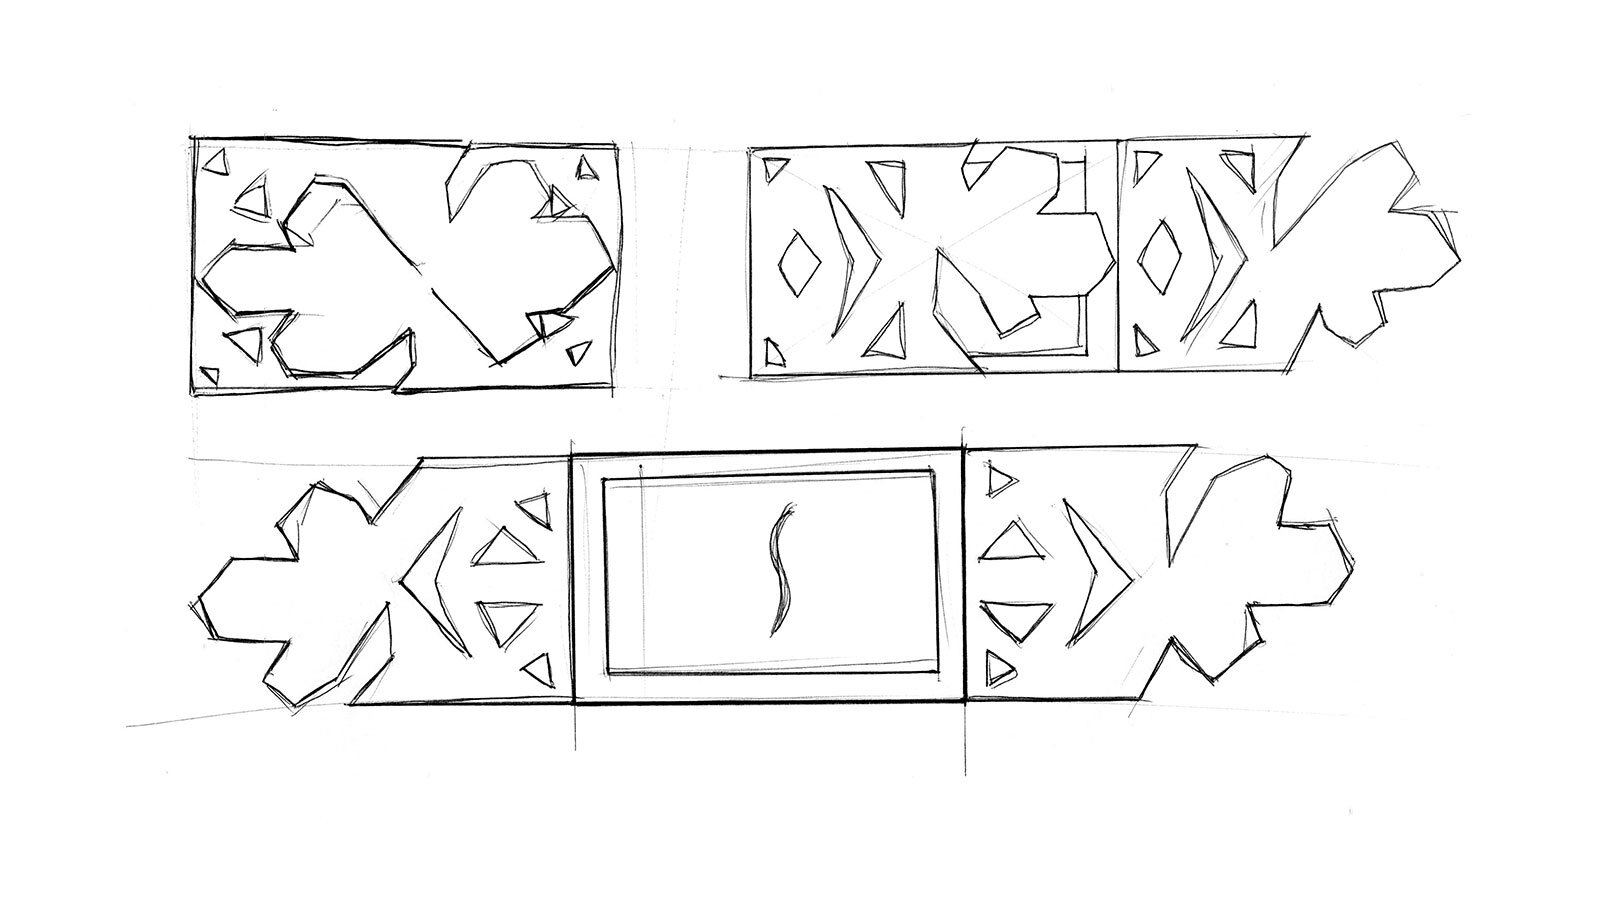 Sephora-snowflake-holiday-gift-card-packaging-company-design-1.jpg